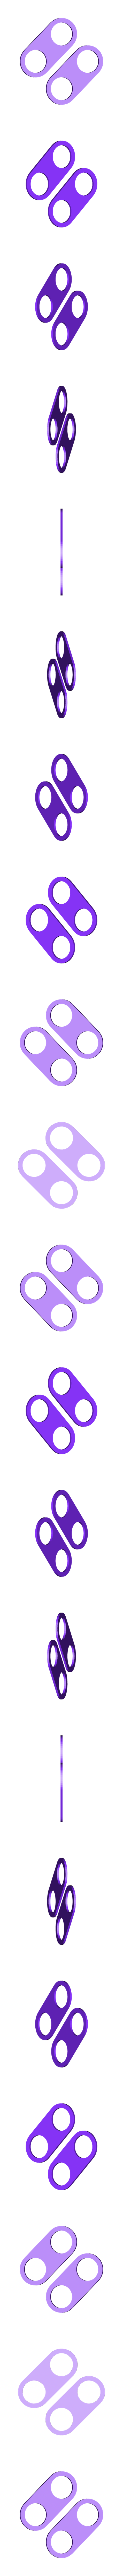 joy-btn-mask.stl Download free STL file Joy The Gamepad Controller • 3D printable object, Adafruit